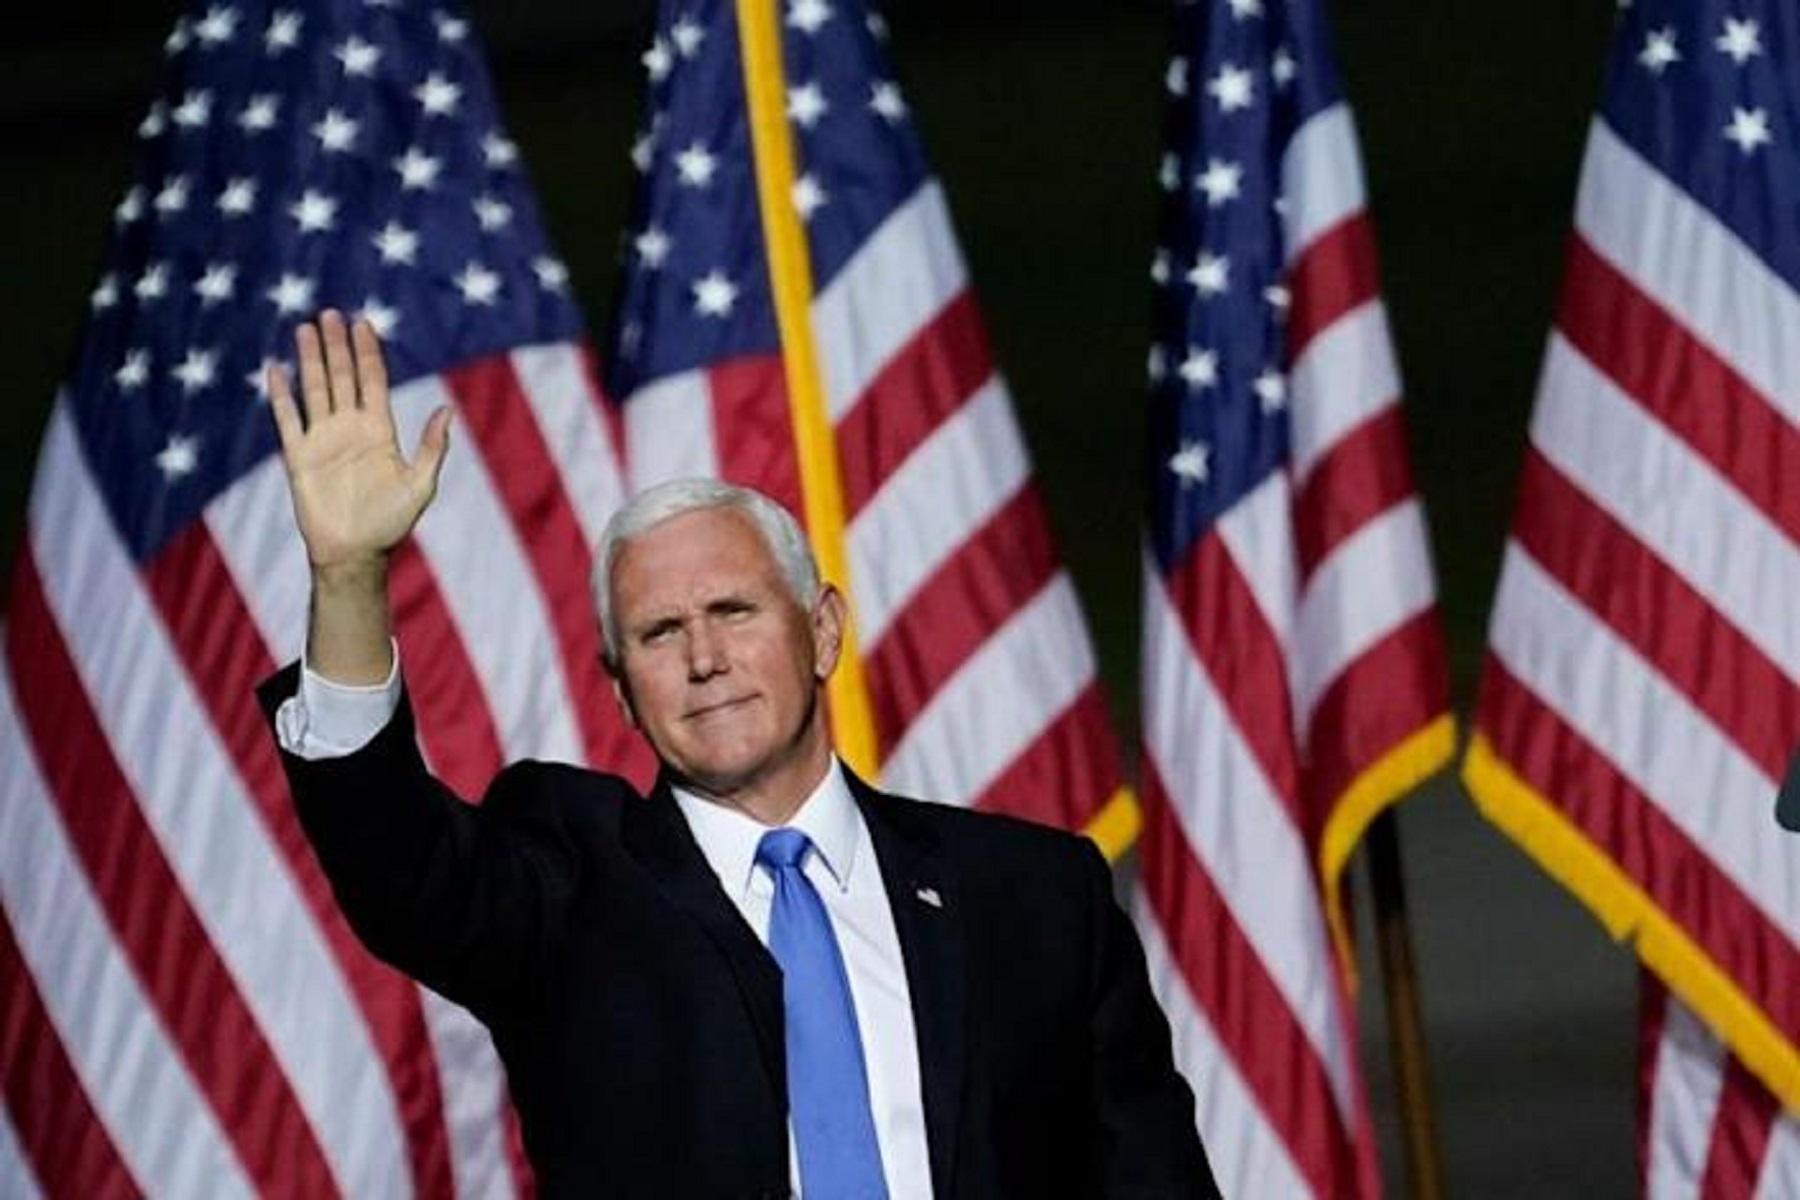 Mike Pence: Ο πρώην αντιπρόεδρος των ΗΠΑ λαμβάνει βηματοδότη μετά από αργό καρδιακό ρυθμό